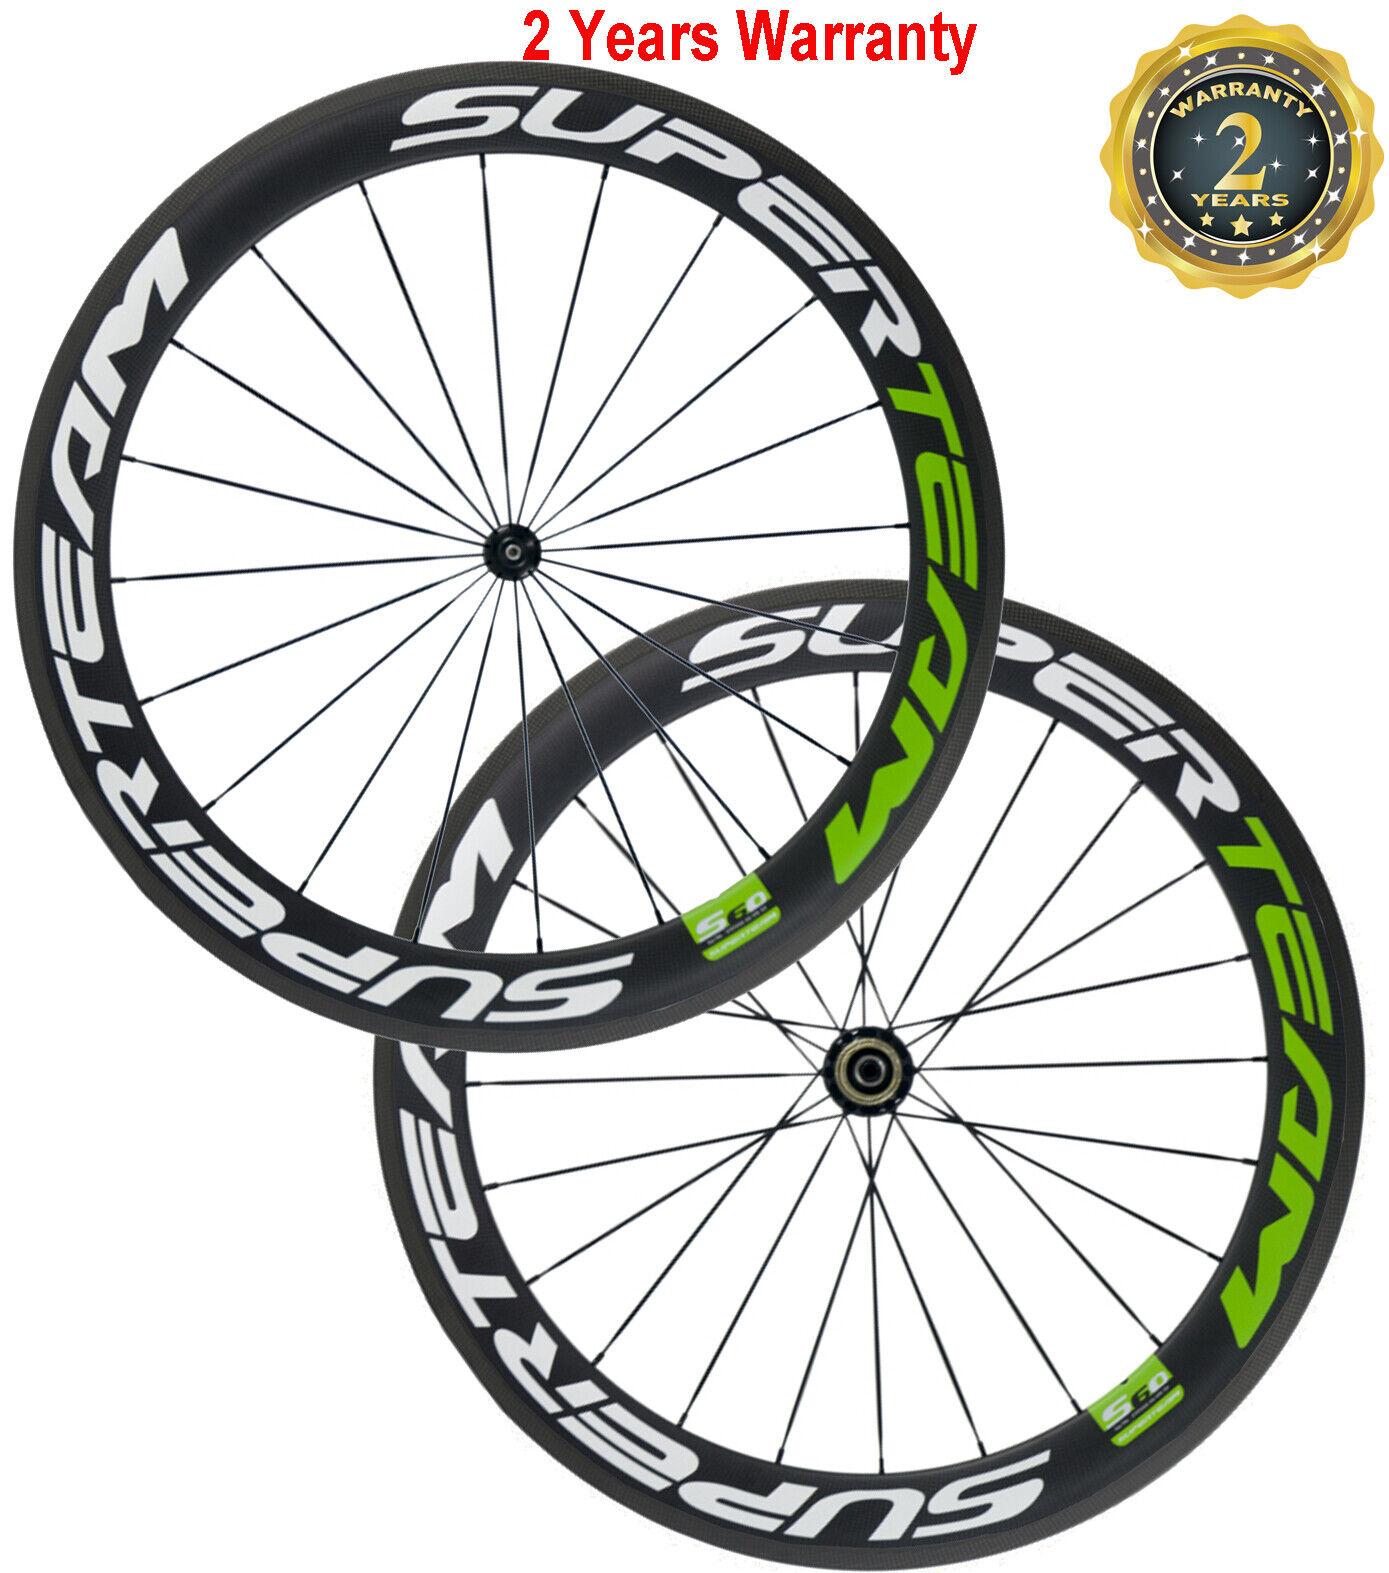 Carbon wheelset 60mm Rim Tubular 11-Fold Shimano  23mm Carbon Fibre Wheels  low 40% price